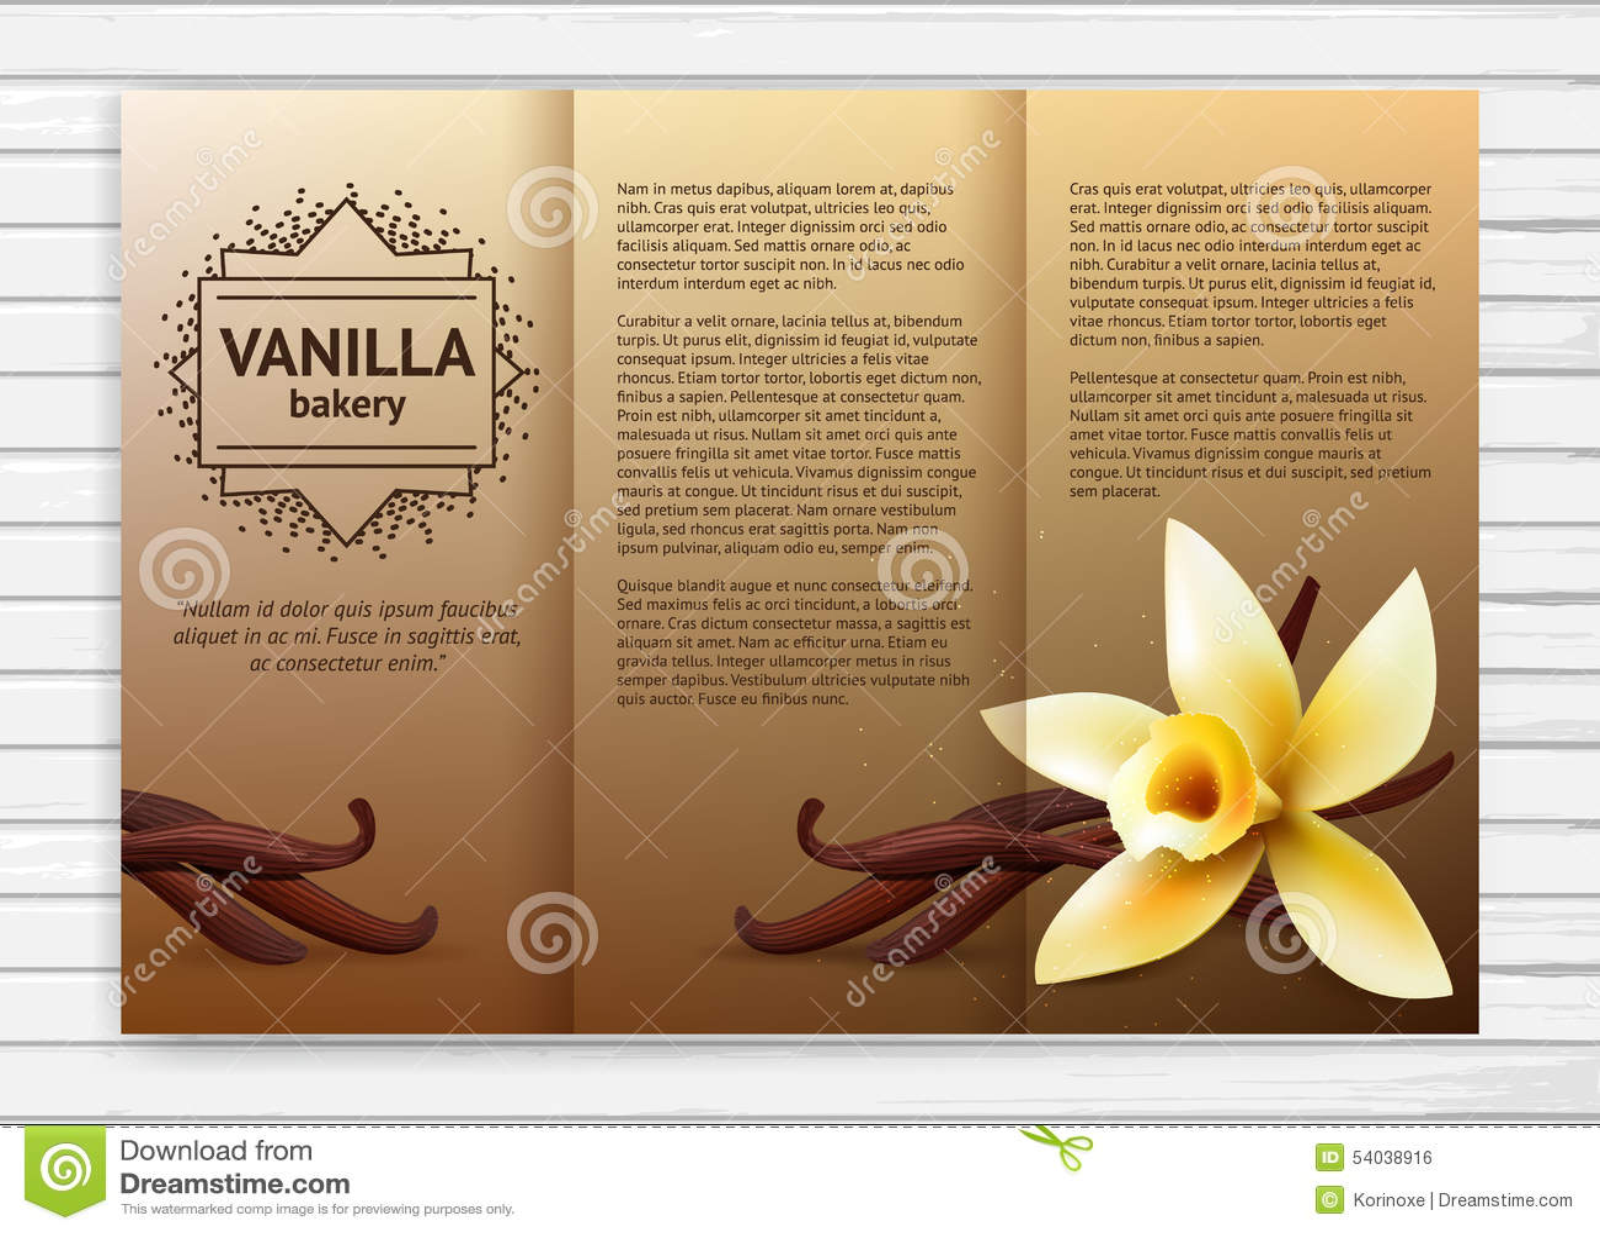 Vanilla Bakery Flyer Stock Vector - Image: 54038916